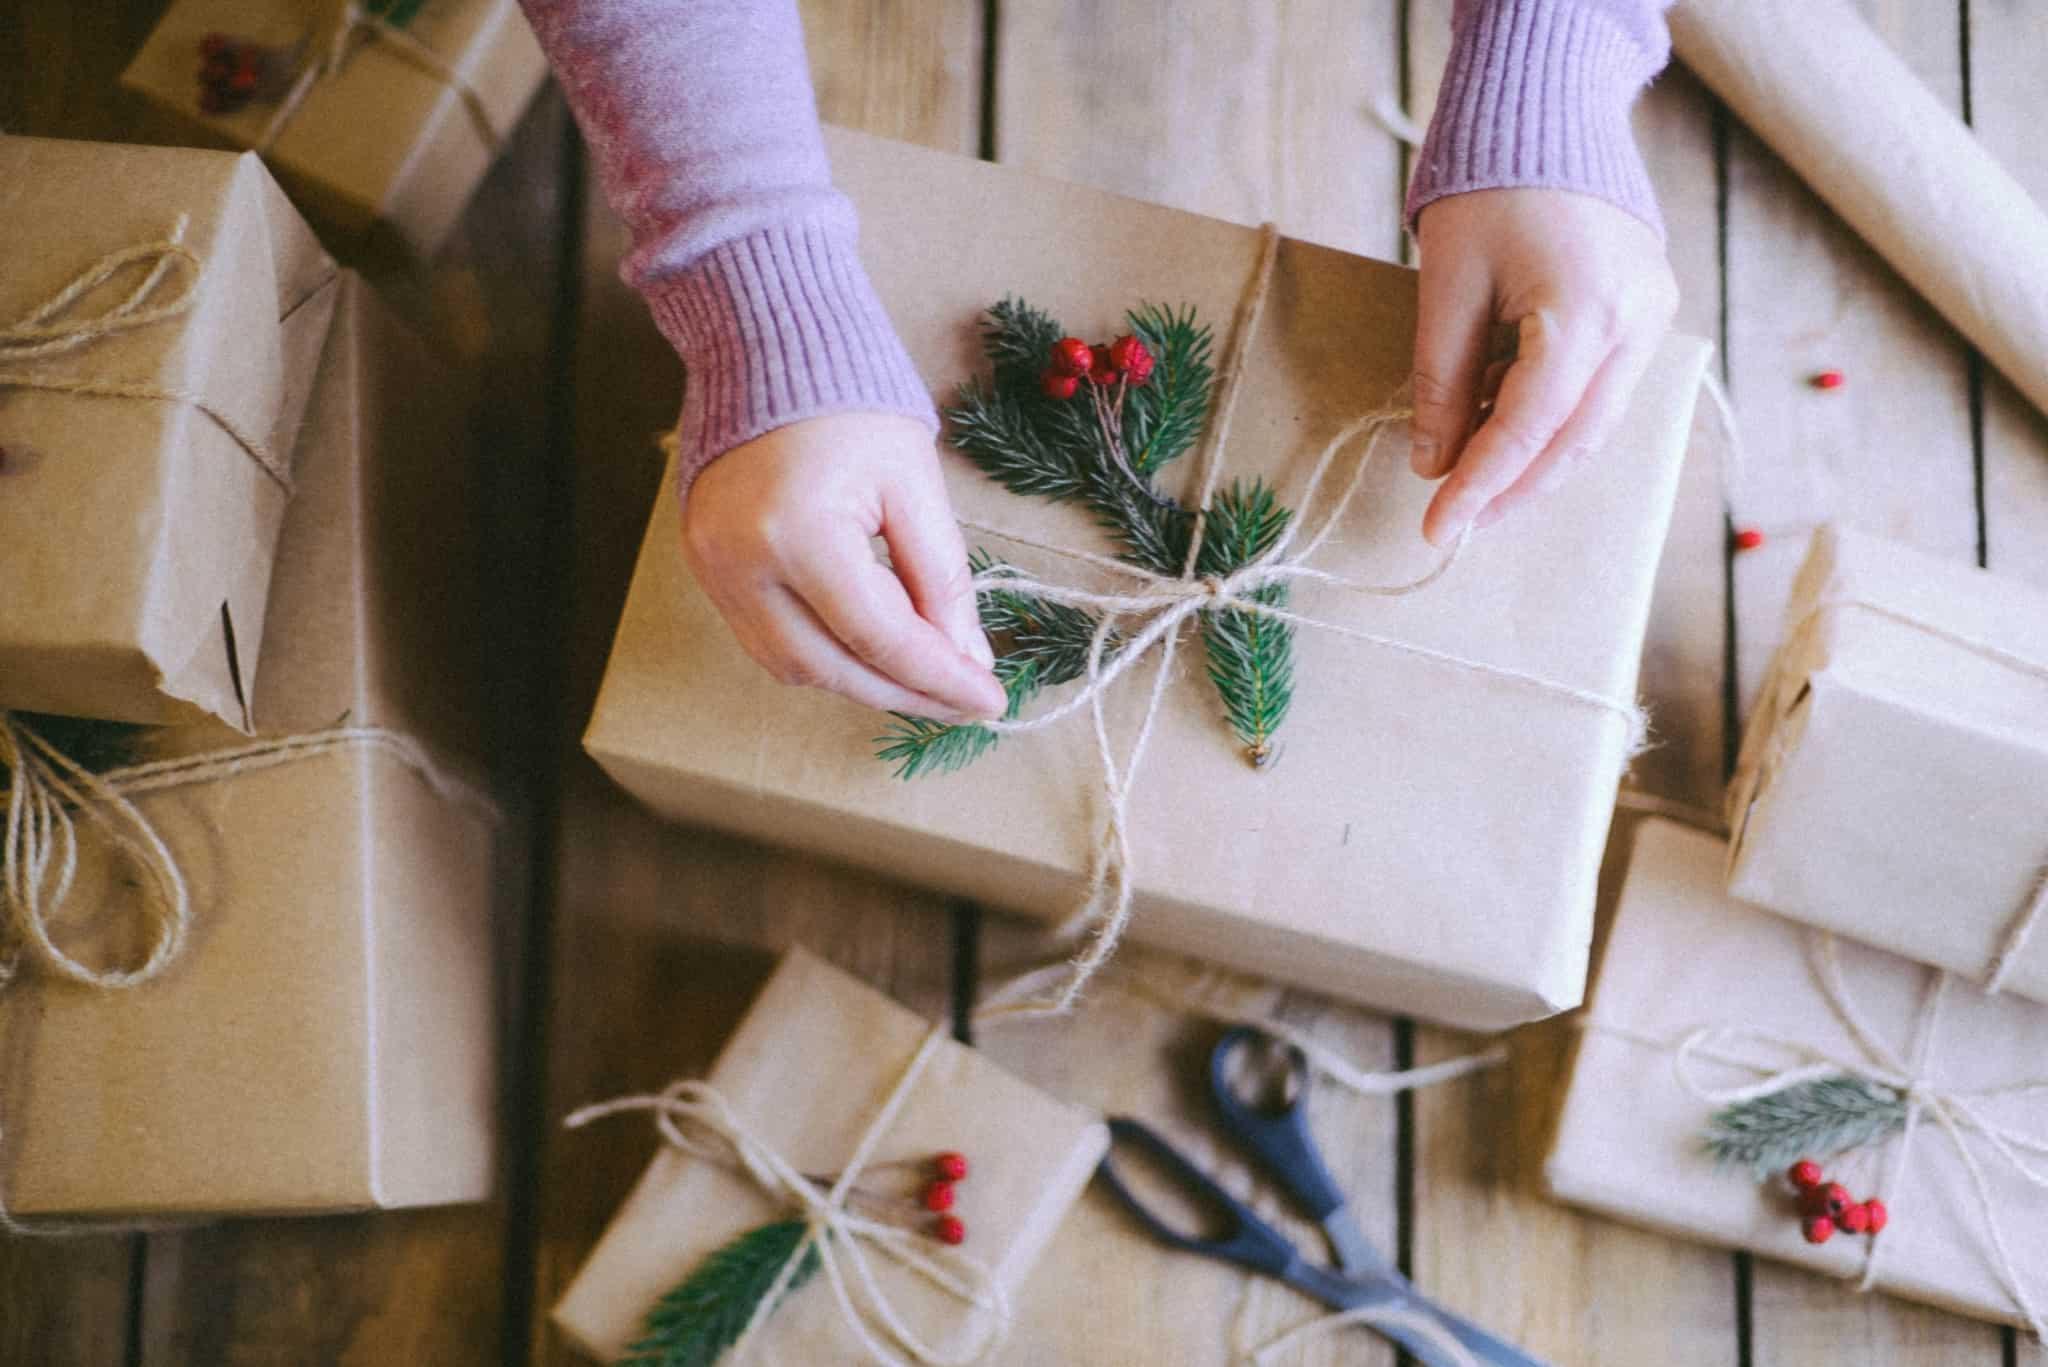 embrulhar prendas de natal